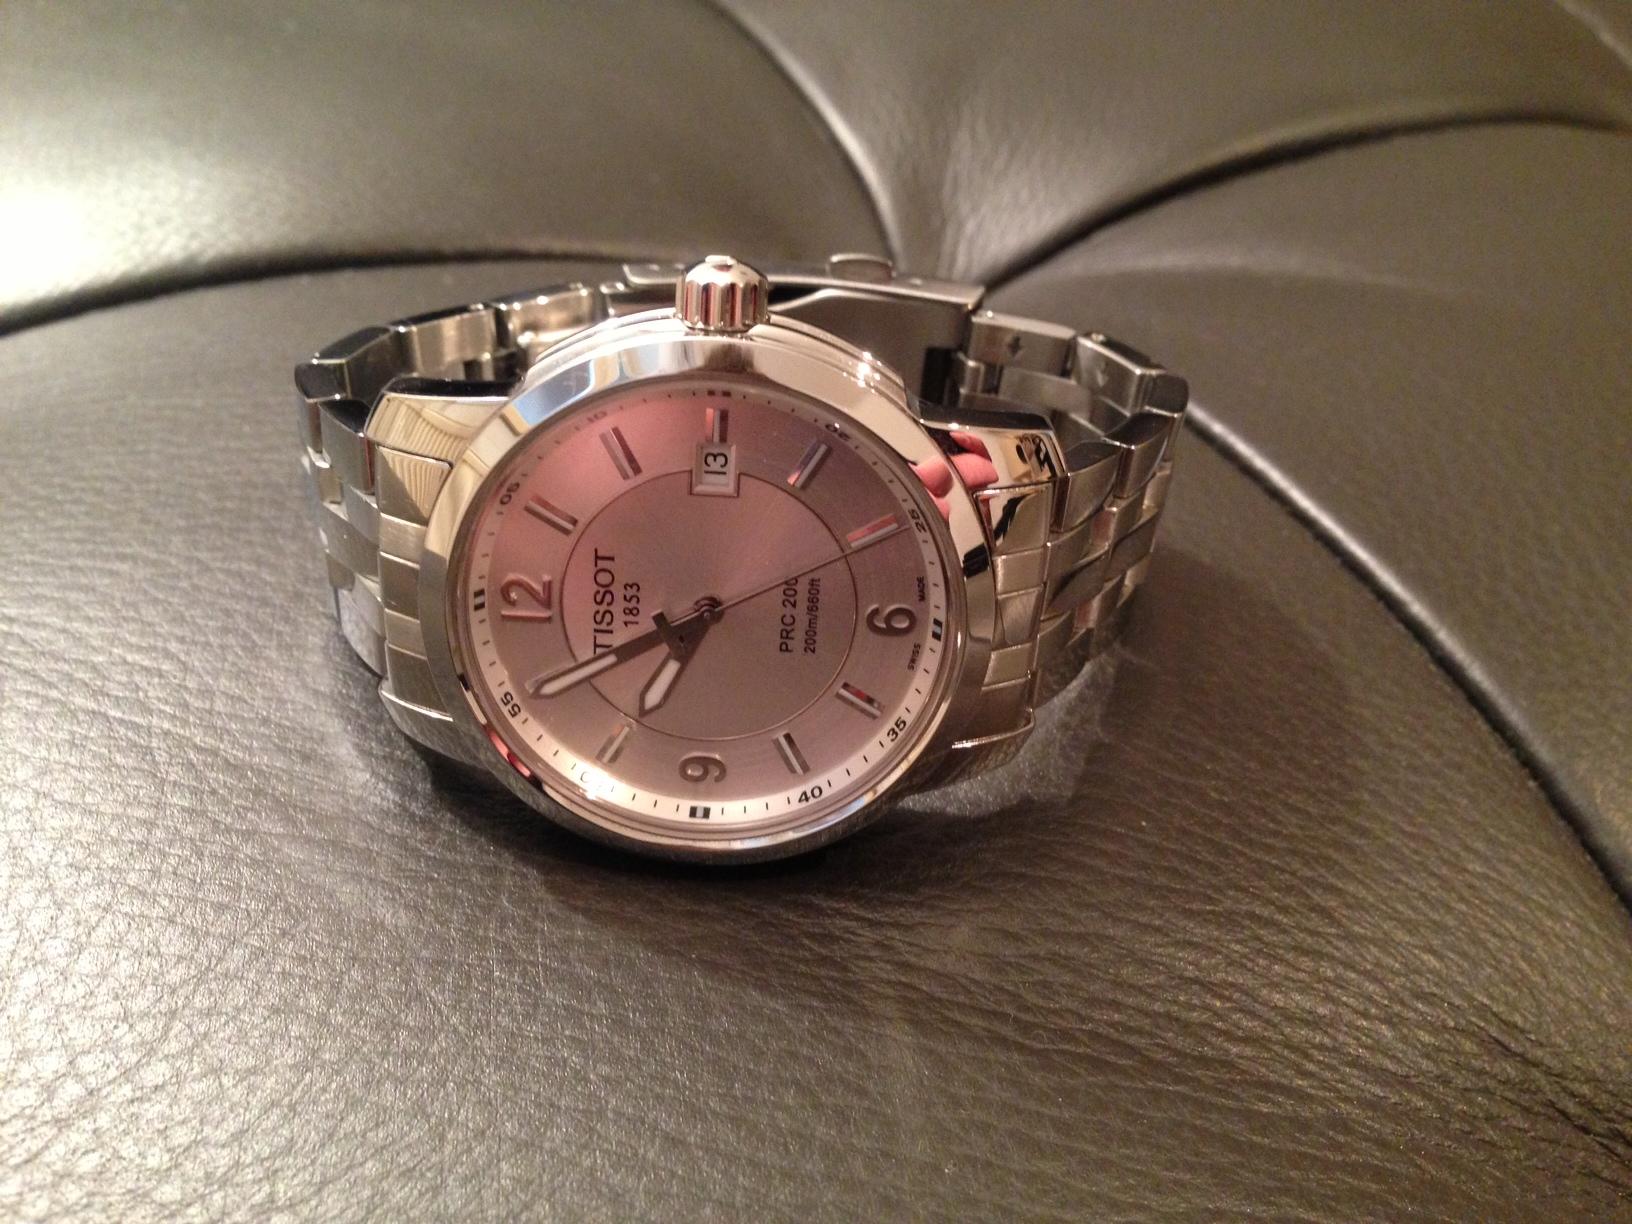 Архив: Часы Tissot PRC 200 оригинал: 4 900 грн